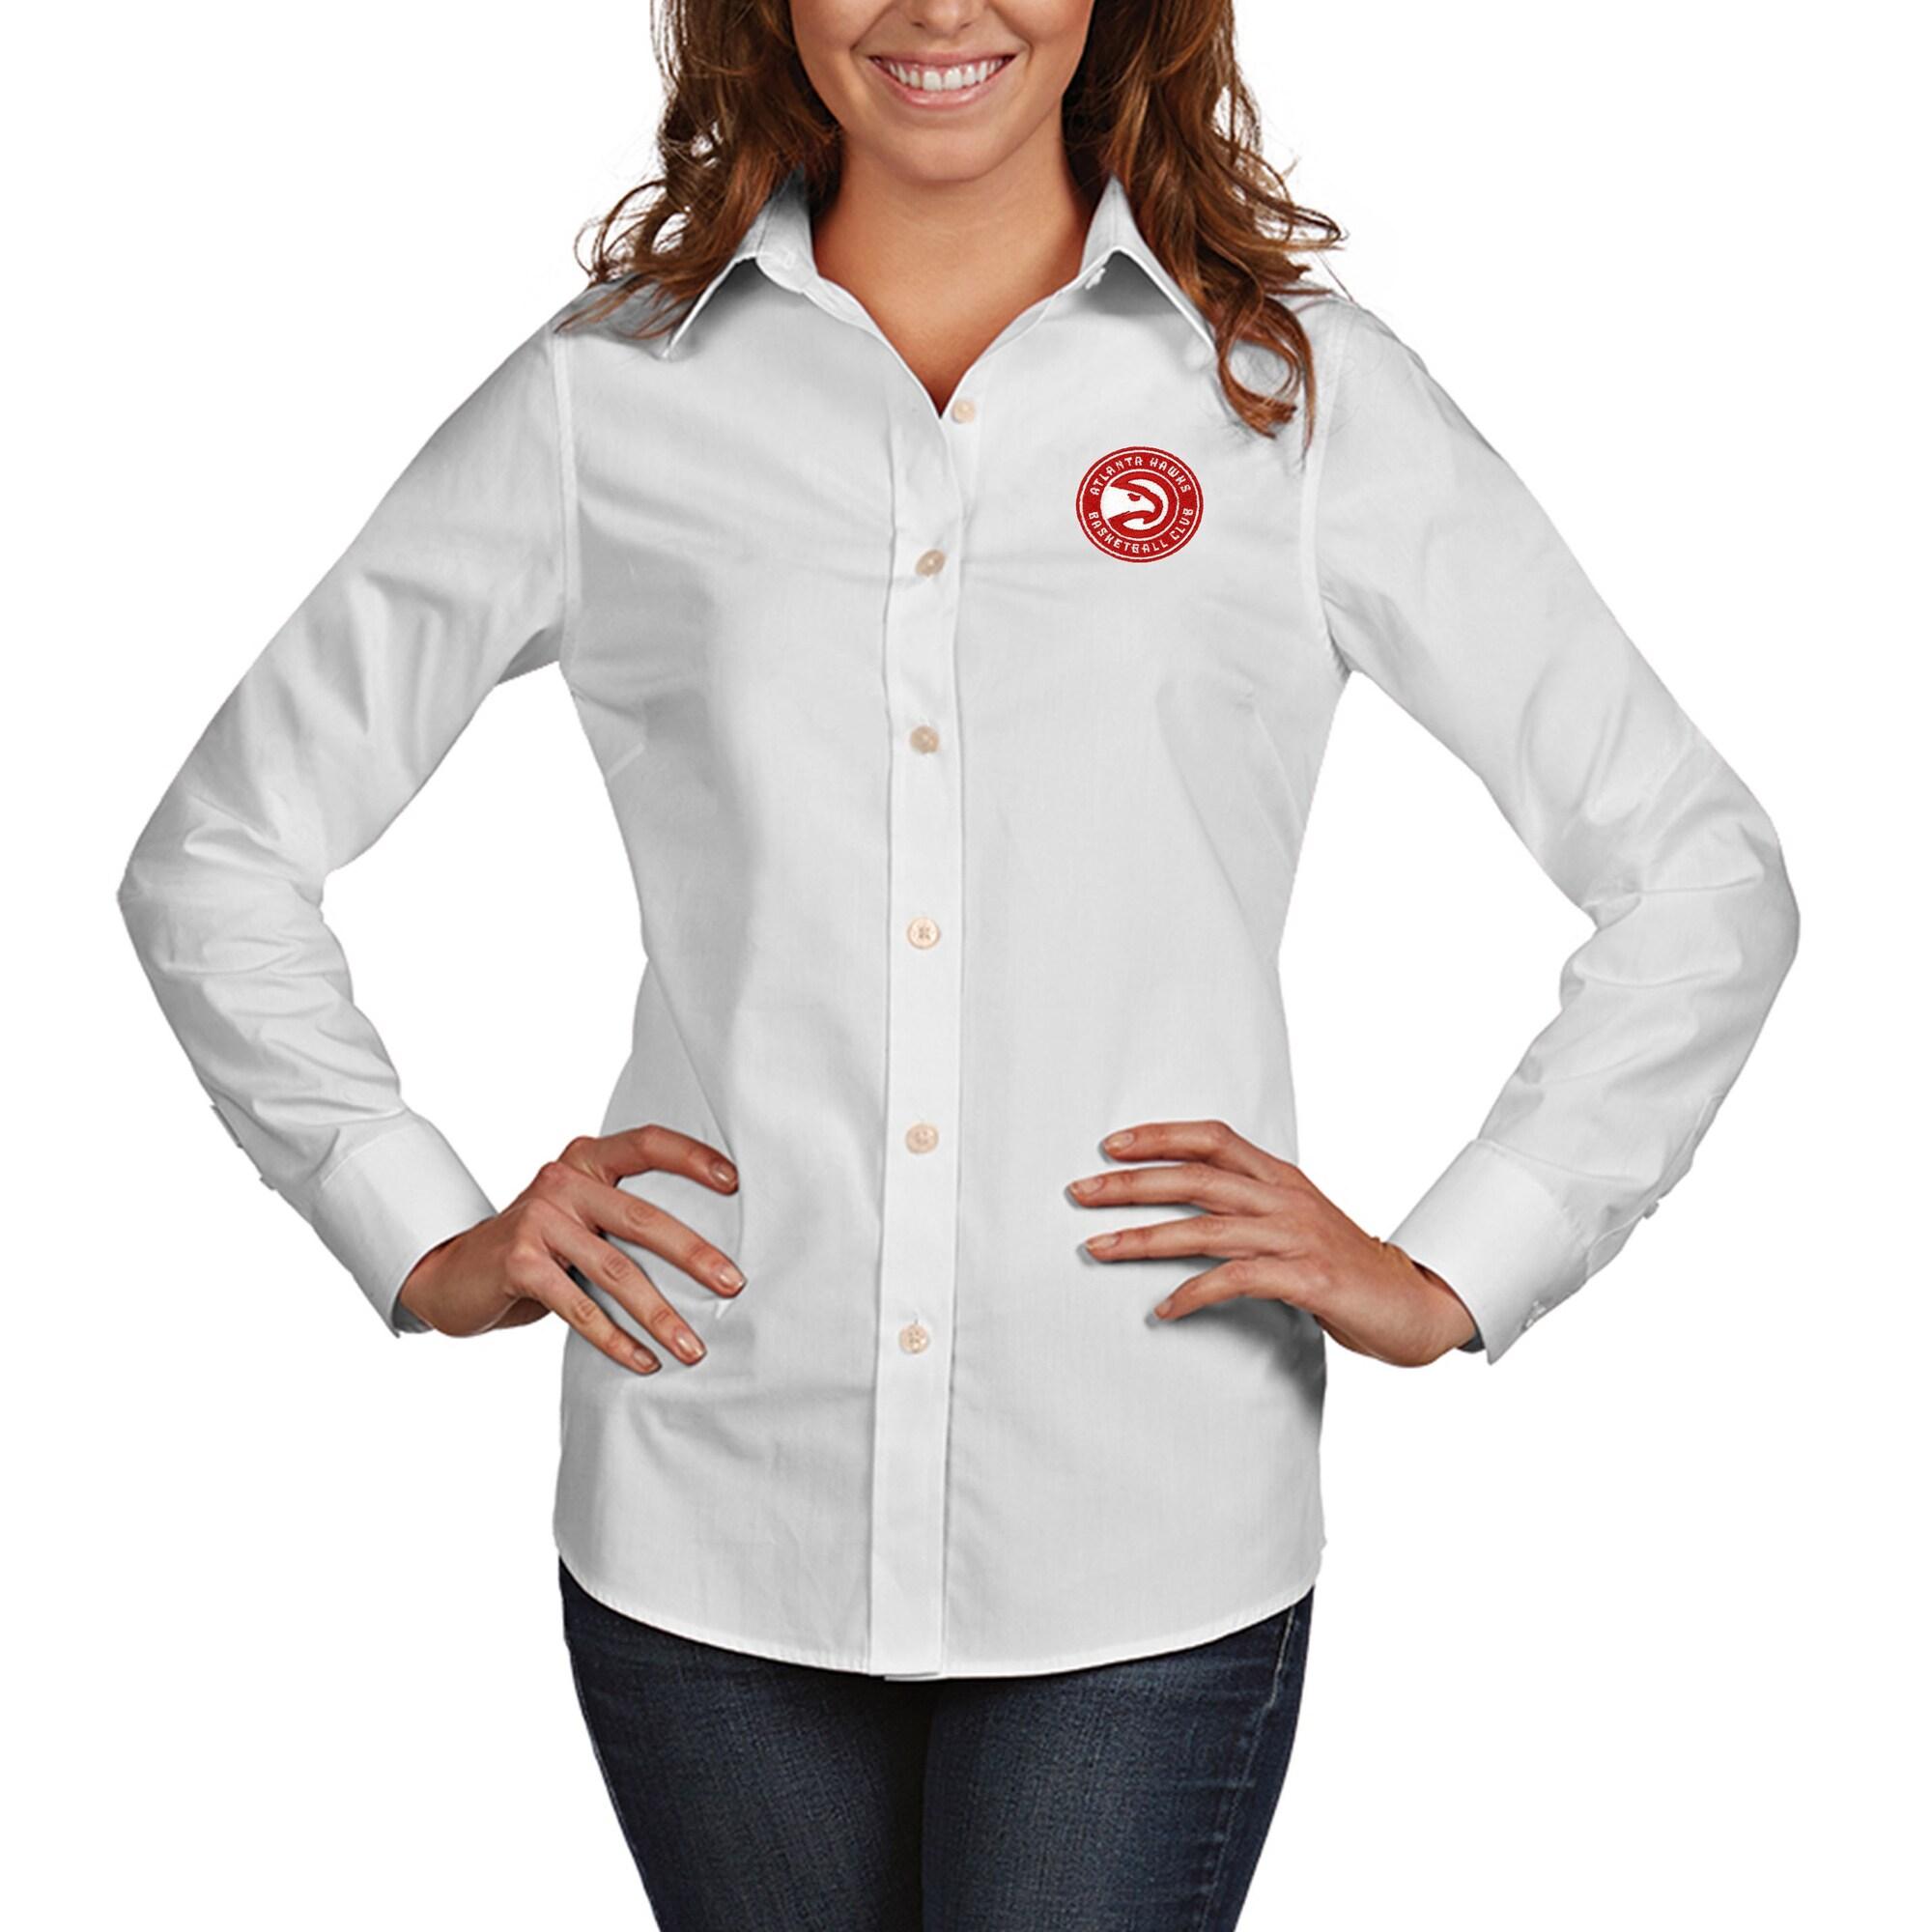 Atlanta Hawks Antigua Women's Dynasty Woven Button-Up Long Sleeve Shirt - White